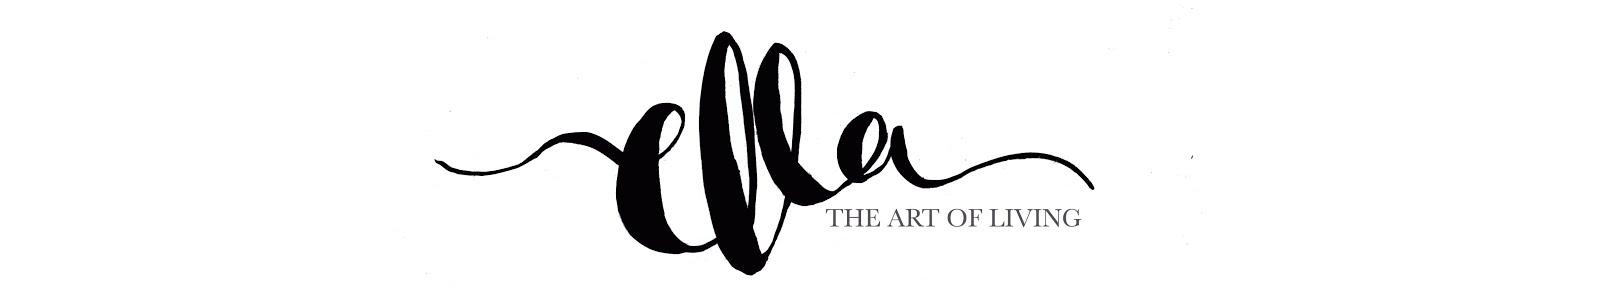 Illustrated Ella - The art of living